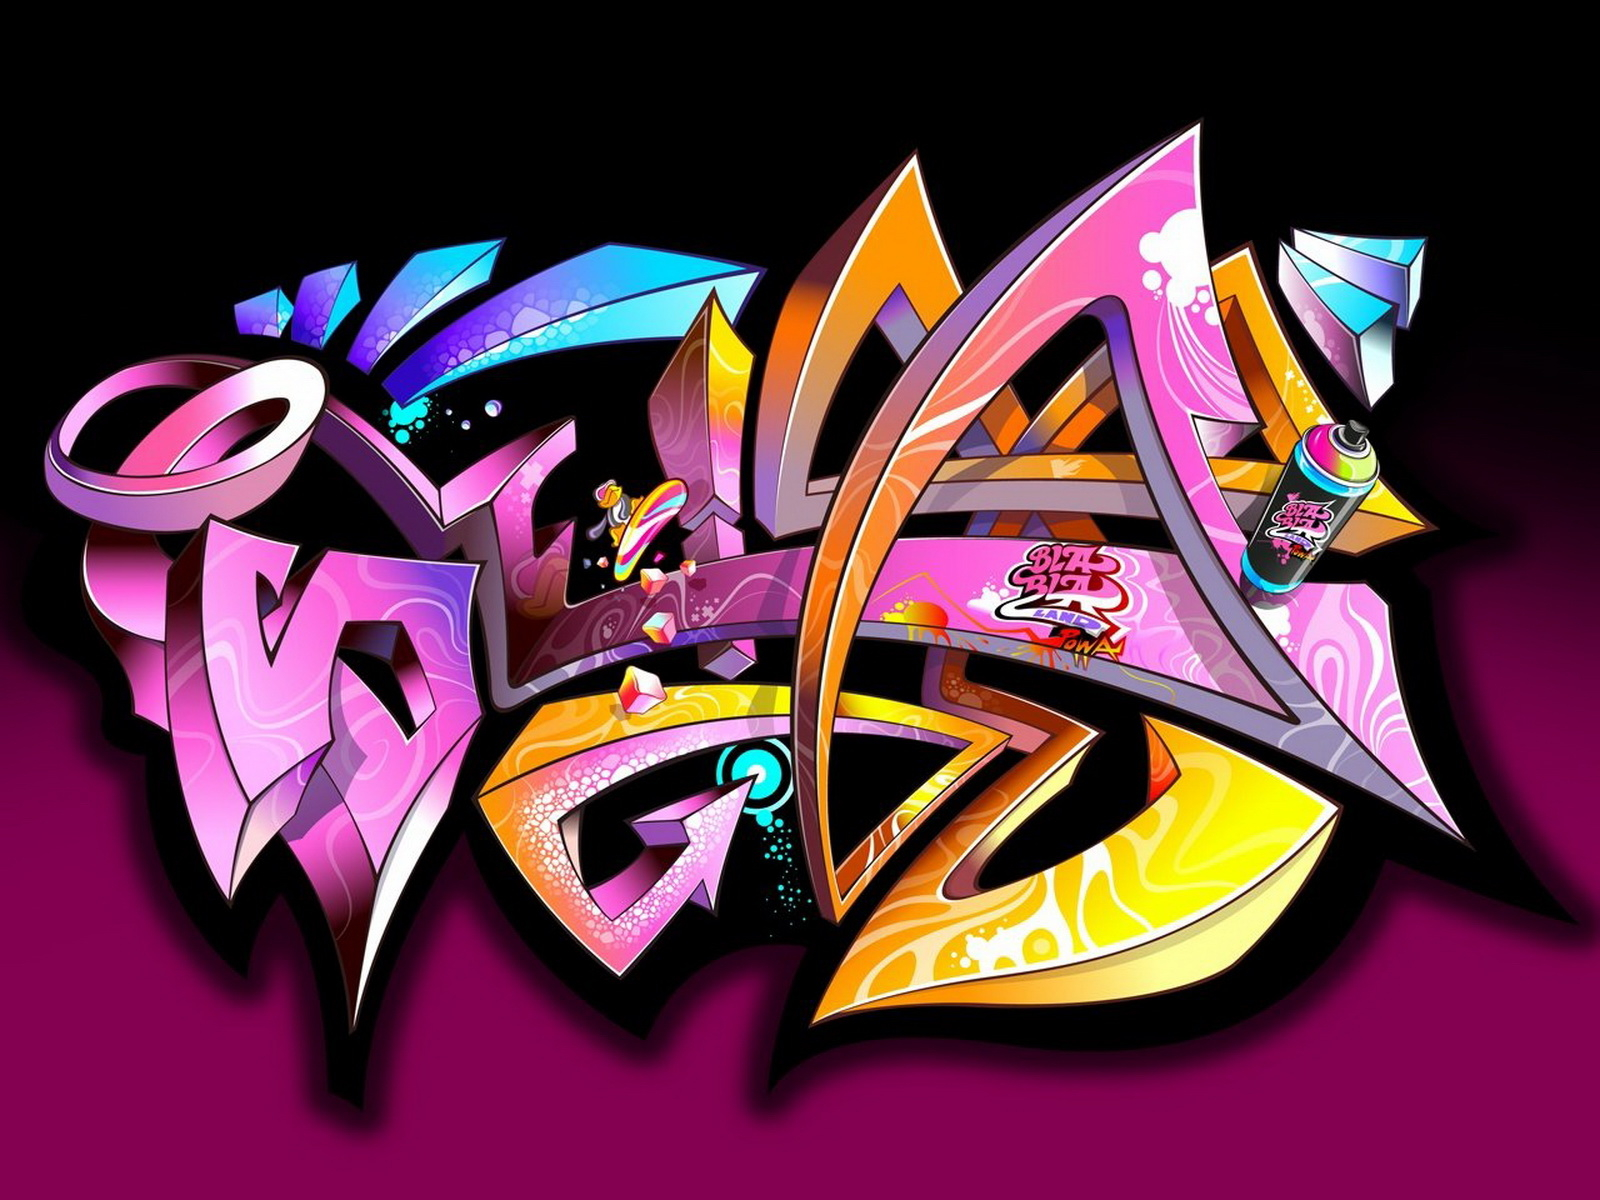 1000+ ideas about Graffiti Wallpaper on Pinterest | Graffiti room